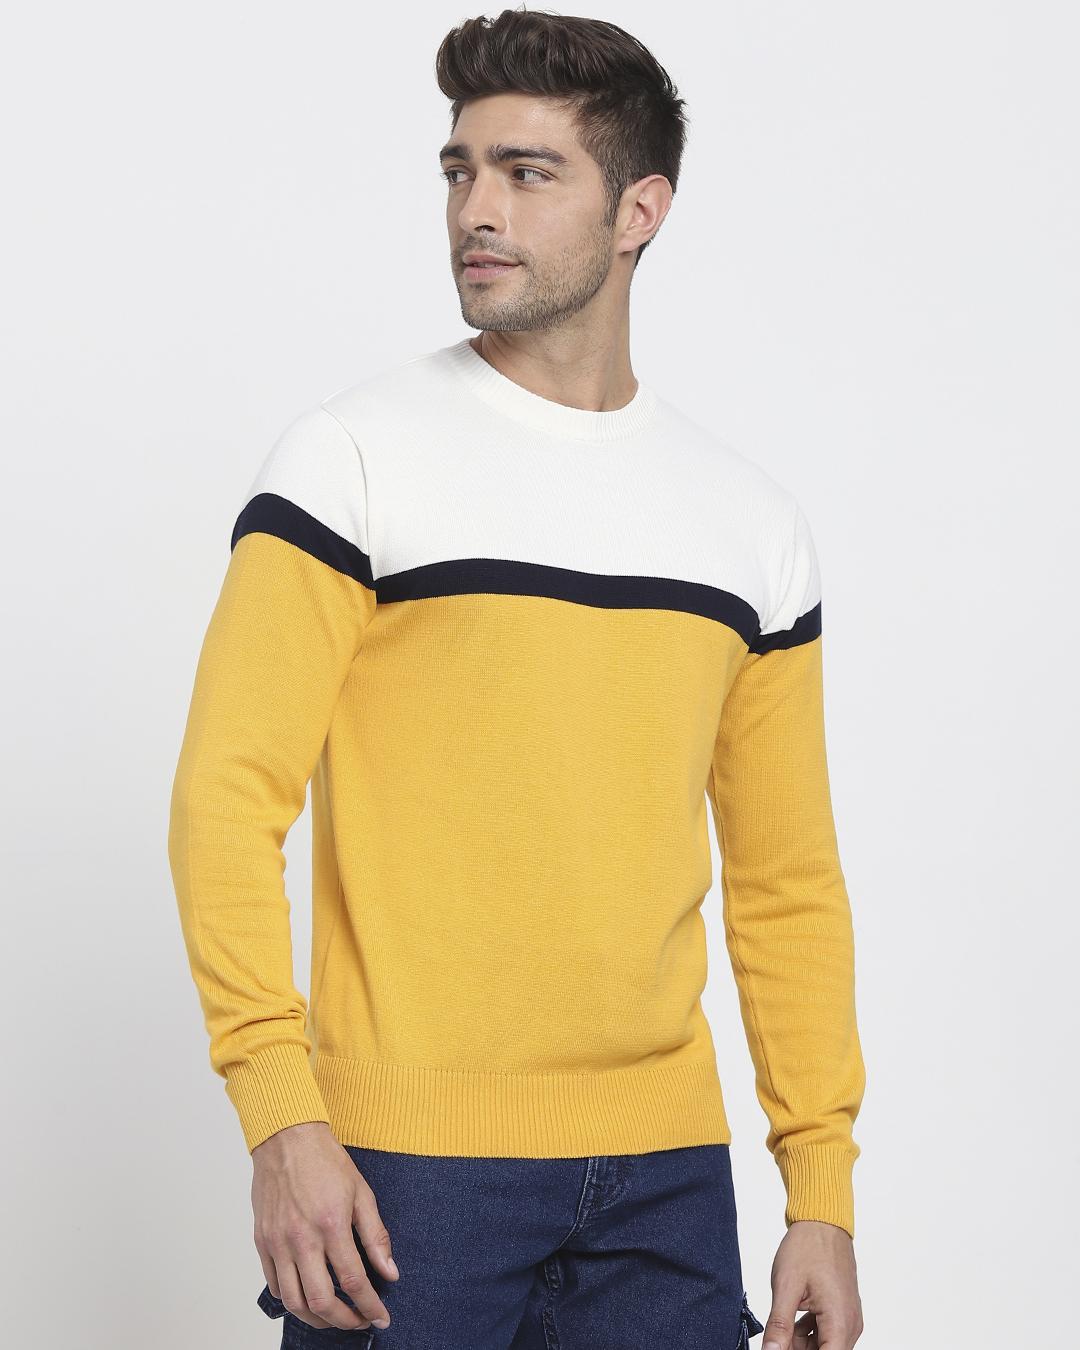 ShopOld Gold Color Block Flat Knit Sweater-Back